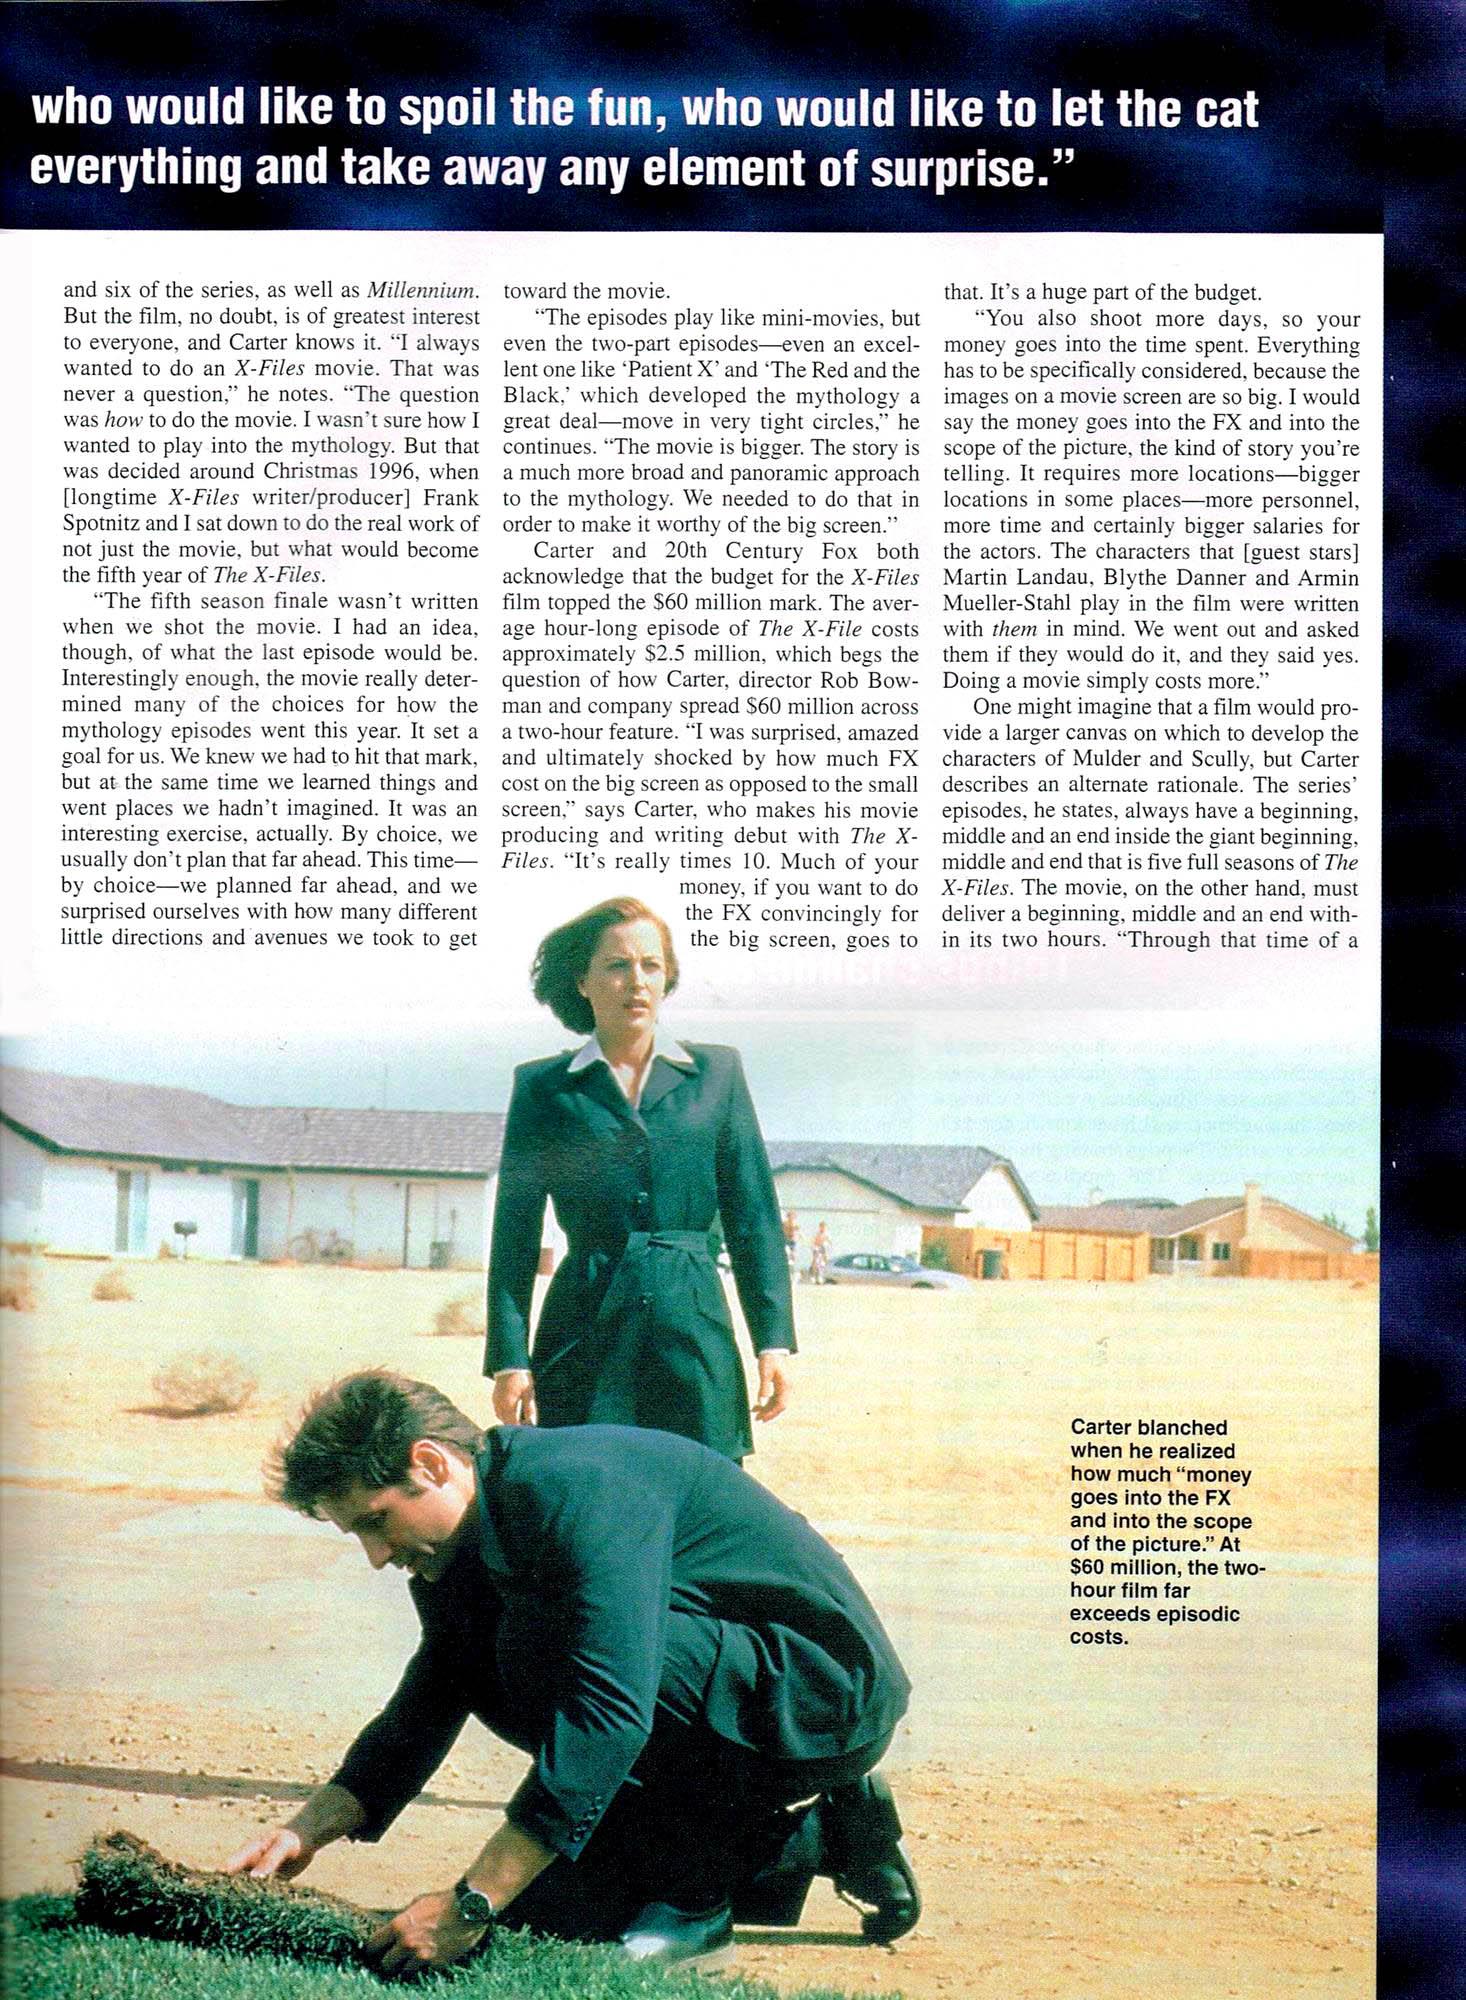 Starlog 252 1998 07 X-Files-6.jpg